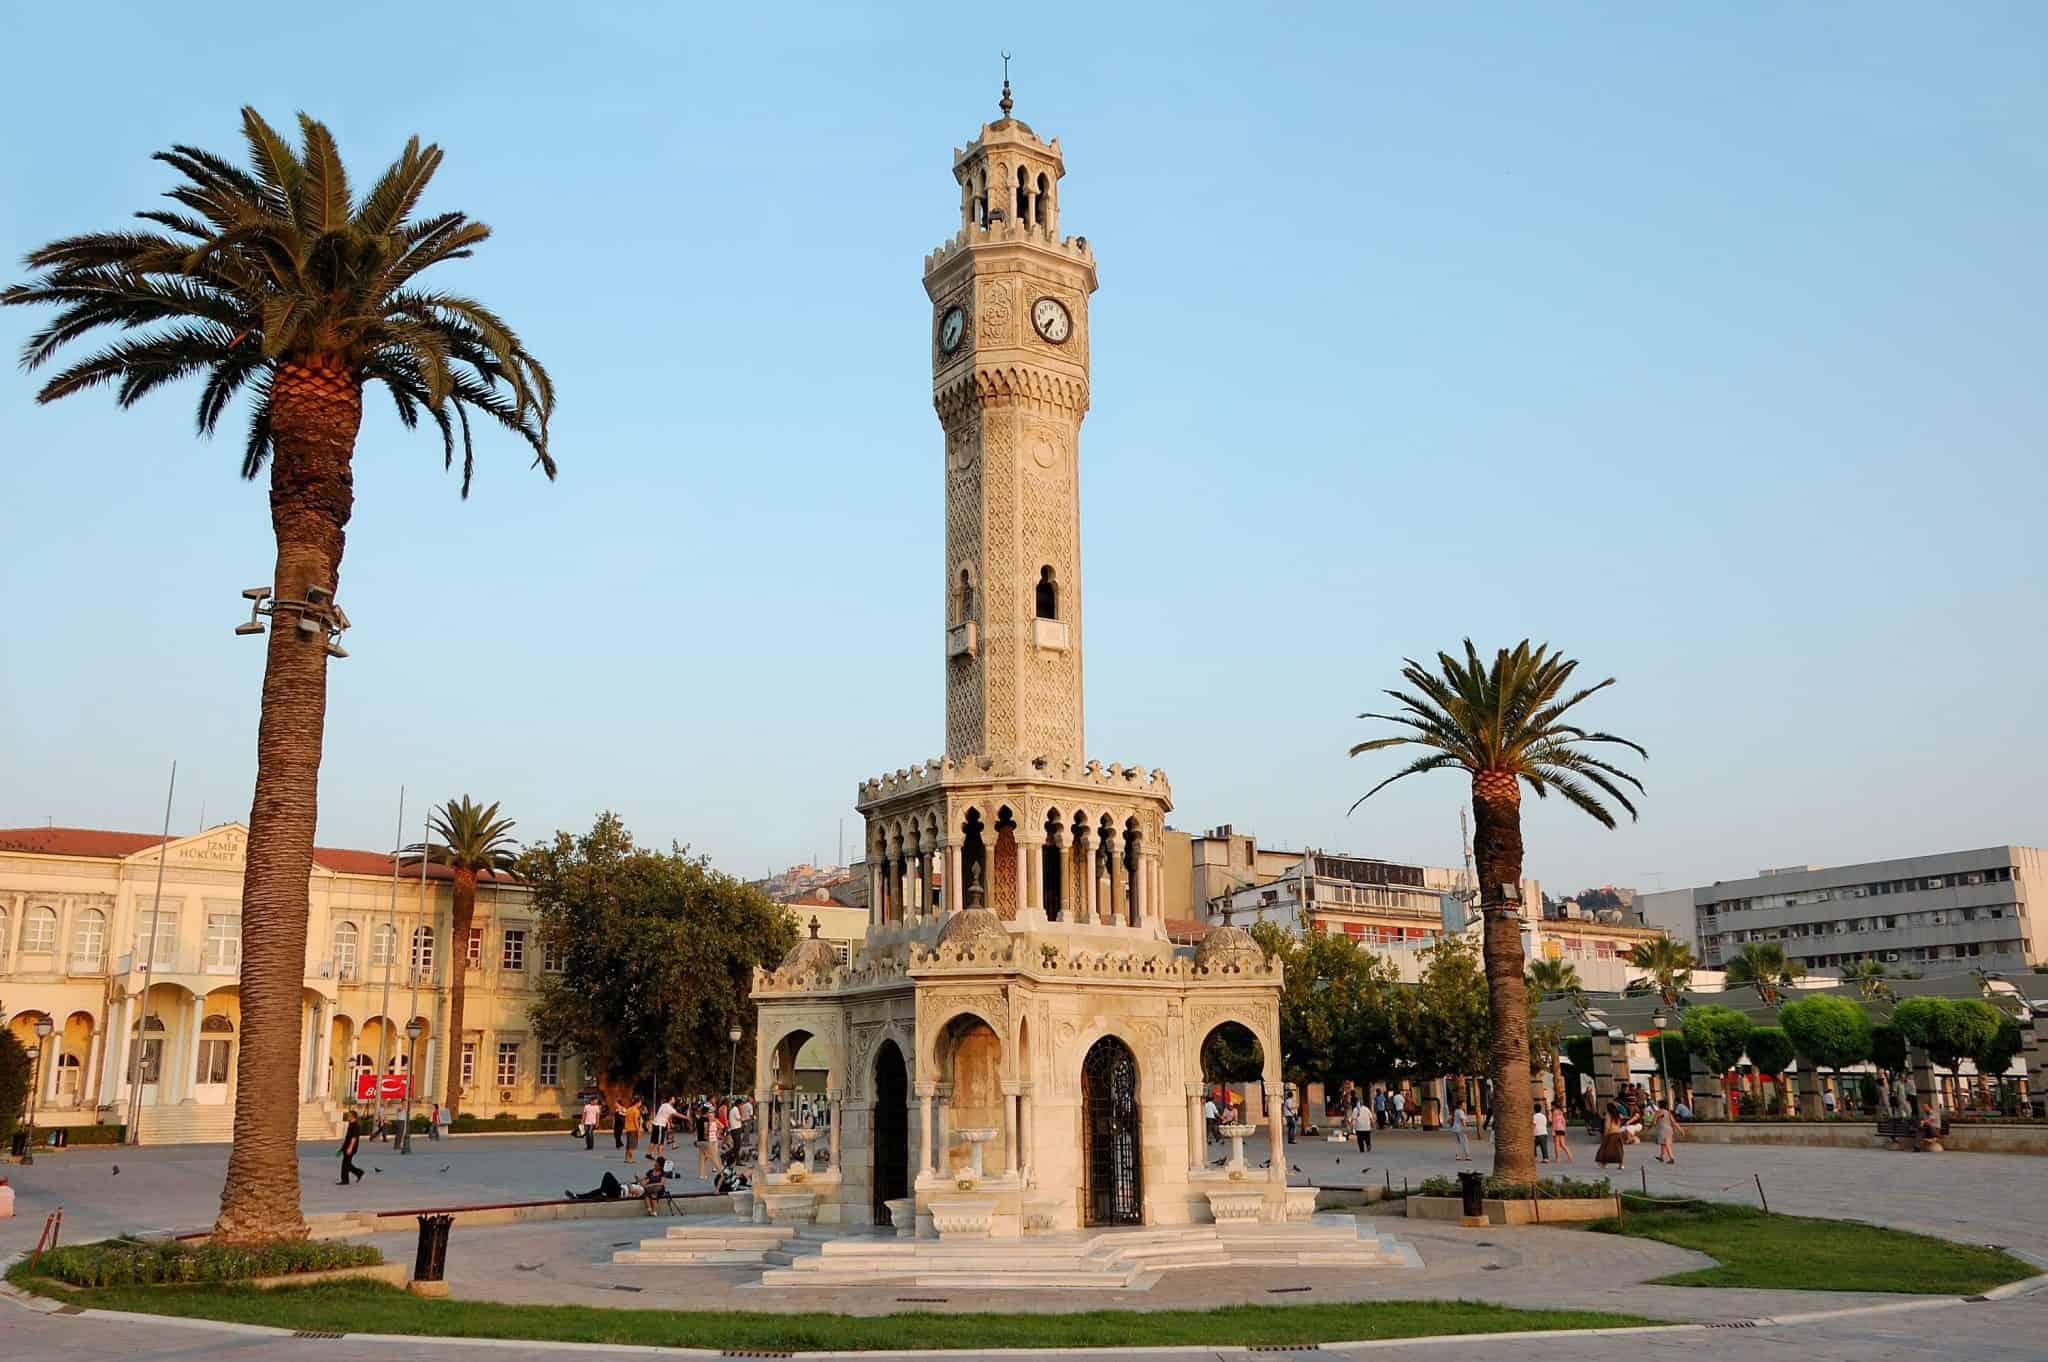 Vacanta in Izmir, Turcia – 7 nopti ( zbor + cazare) – incepand cu 208 euro